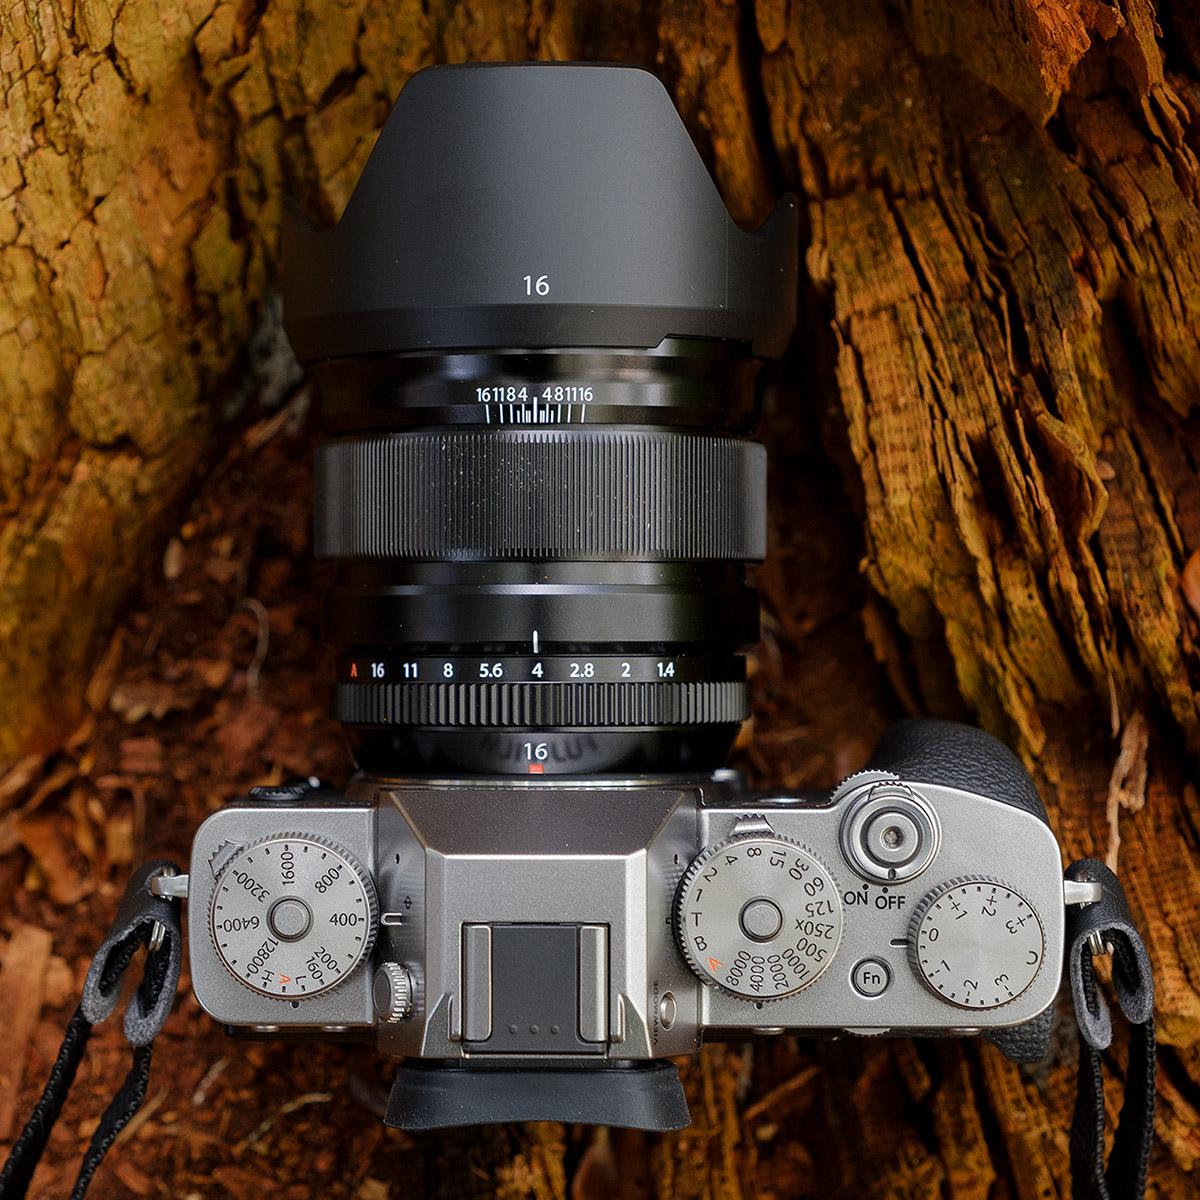 Fujifilm X-T3 met het XF 16mm f/1.4 R WR objectief